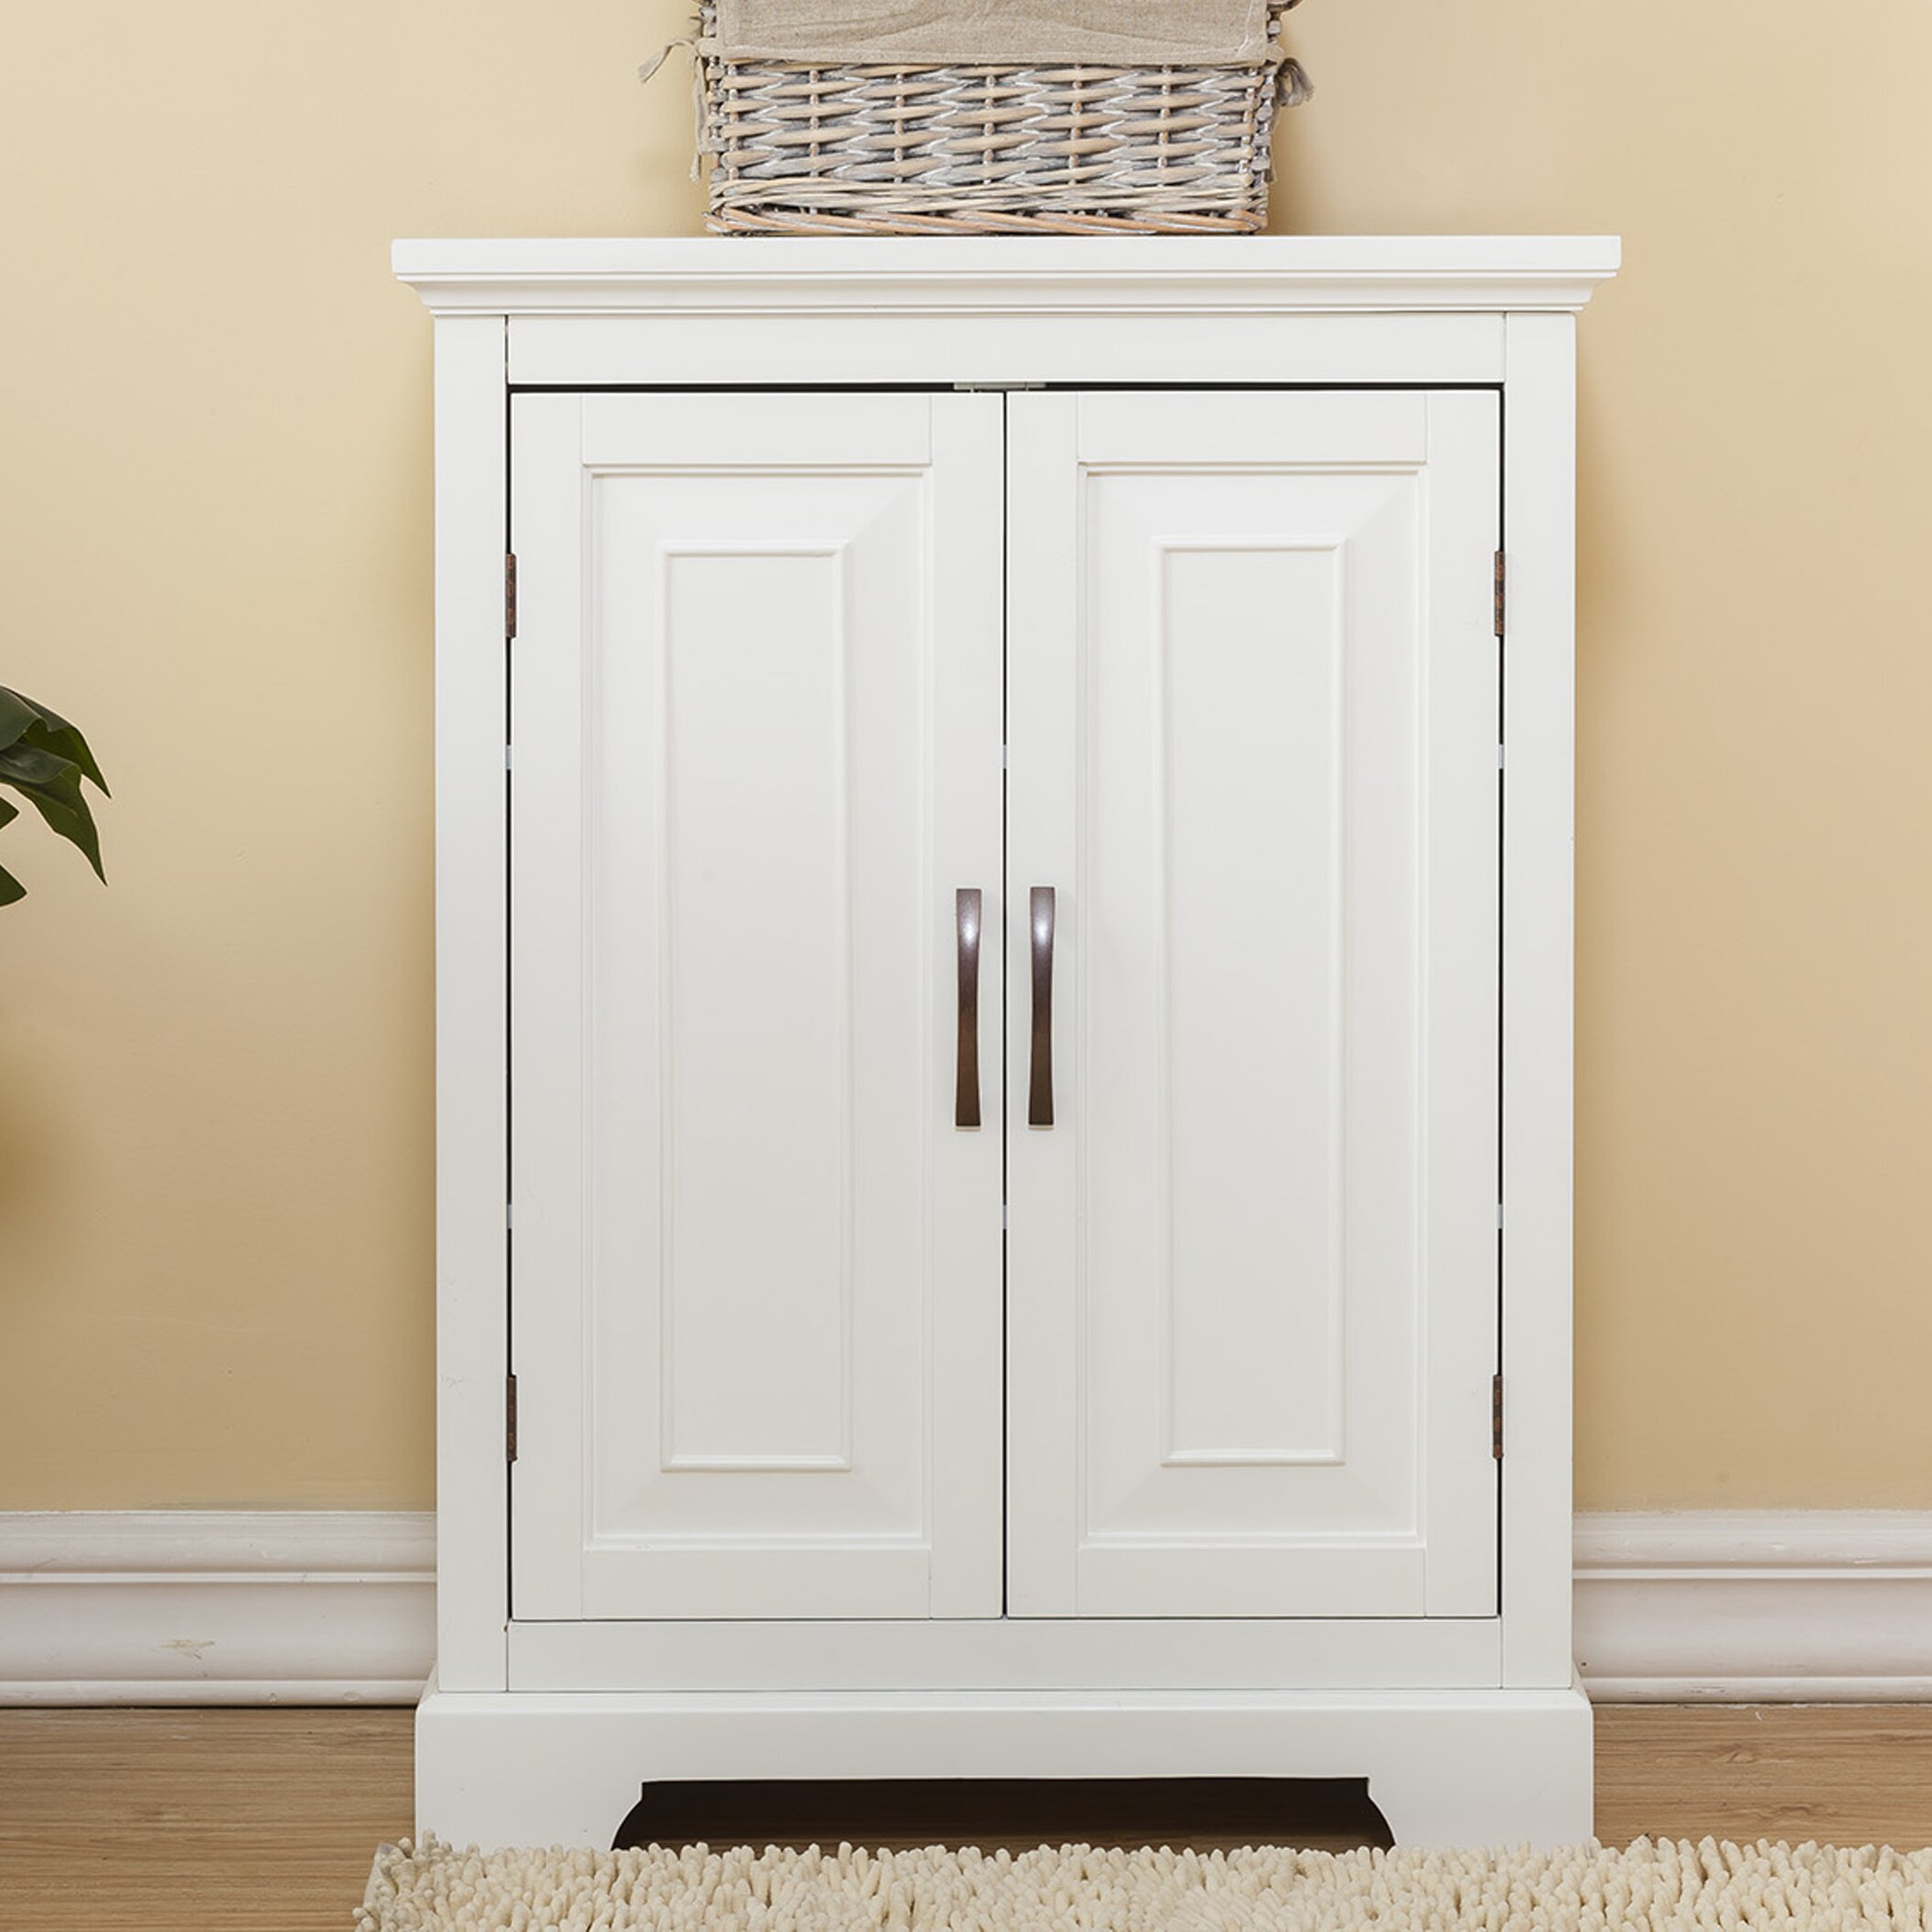 "Wayfair Free Standing Kitchen Cabinets: Alcott Hill Prater 26"" X 32"" Free Standing Cabinet"